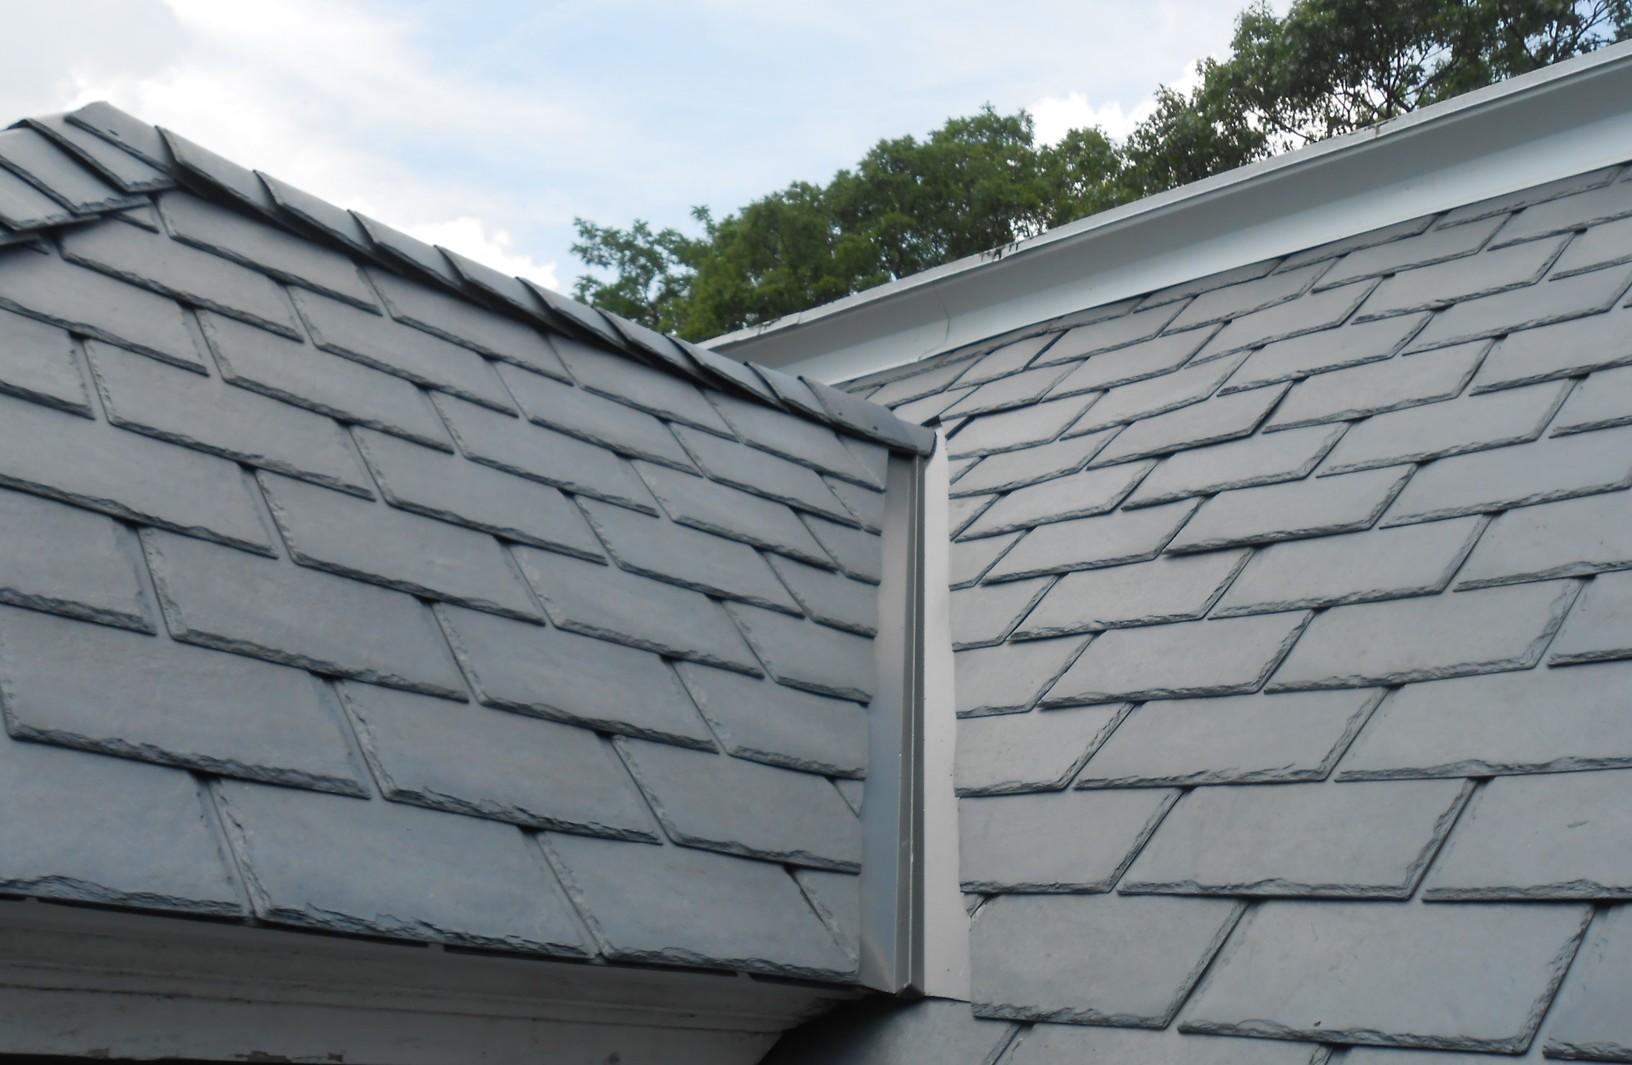 Federal Grey Composite Metal Slate Roof Installation in Trenton, NJ